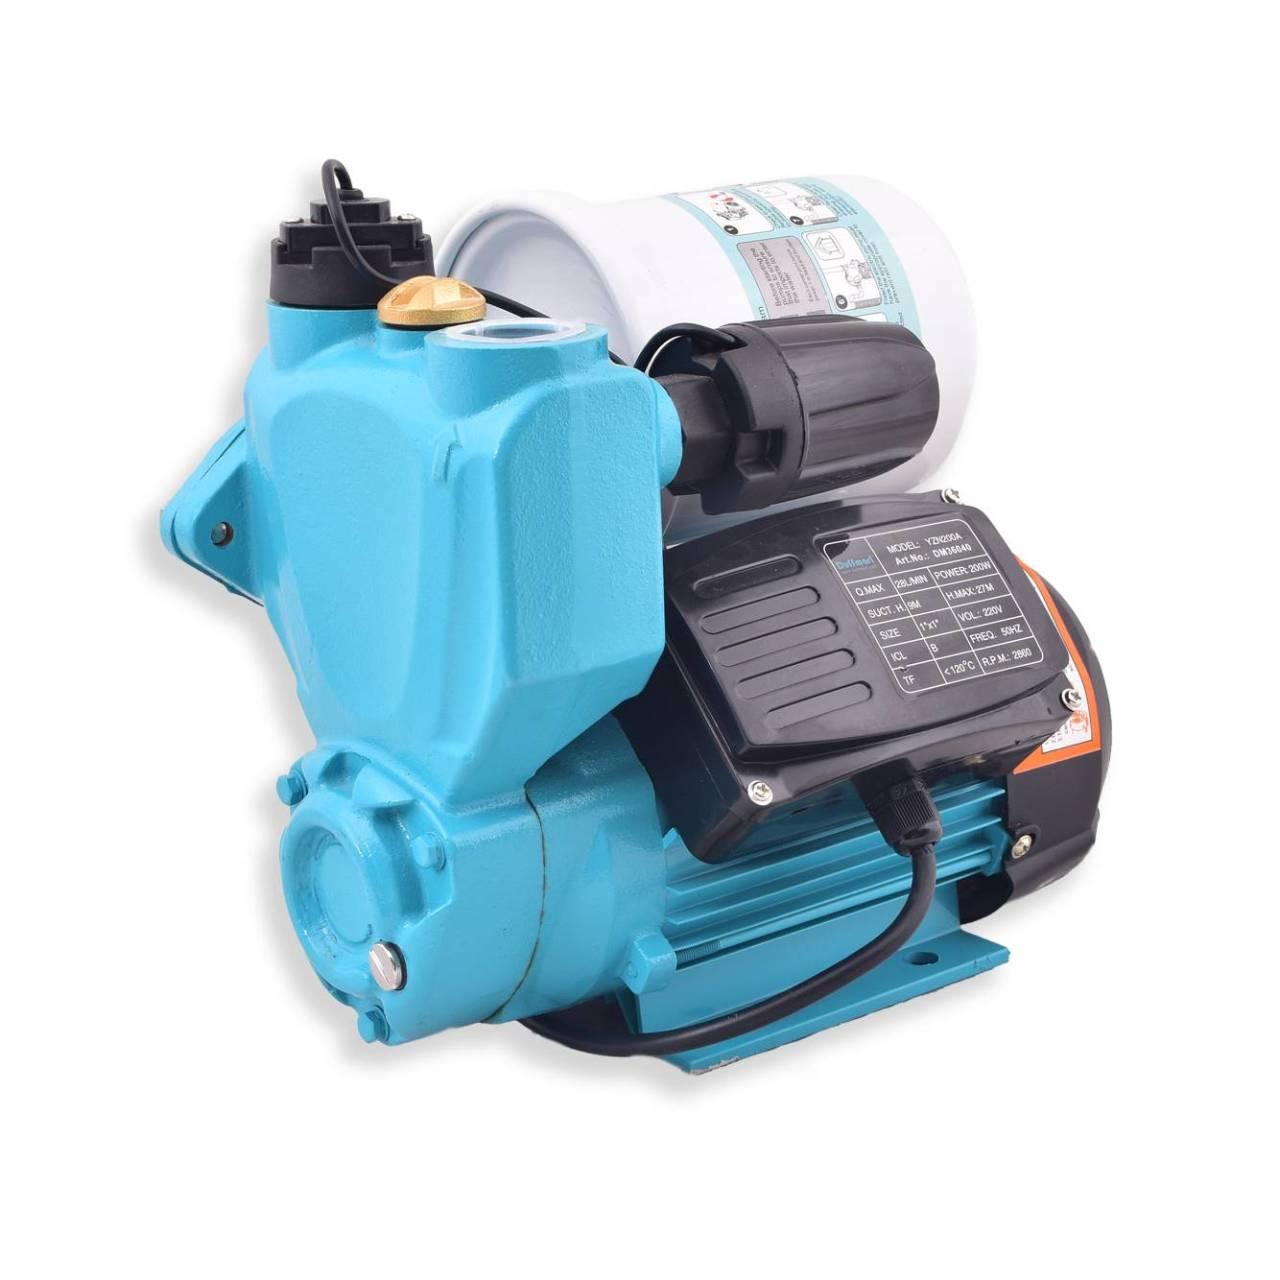 Duffmart YZN800A Otomatik Sıcak-Soğuk Su Hidroforu